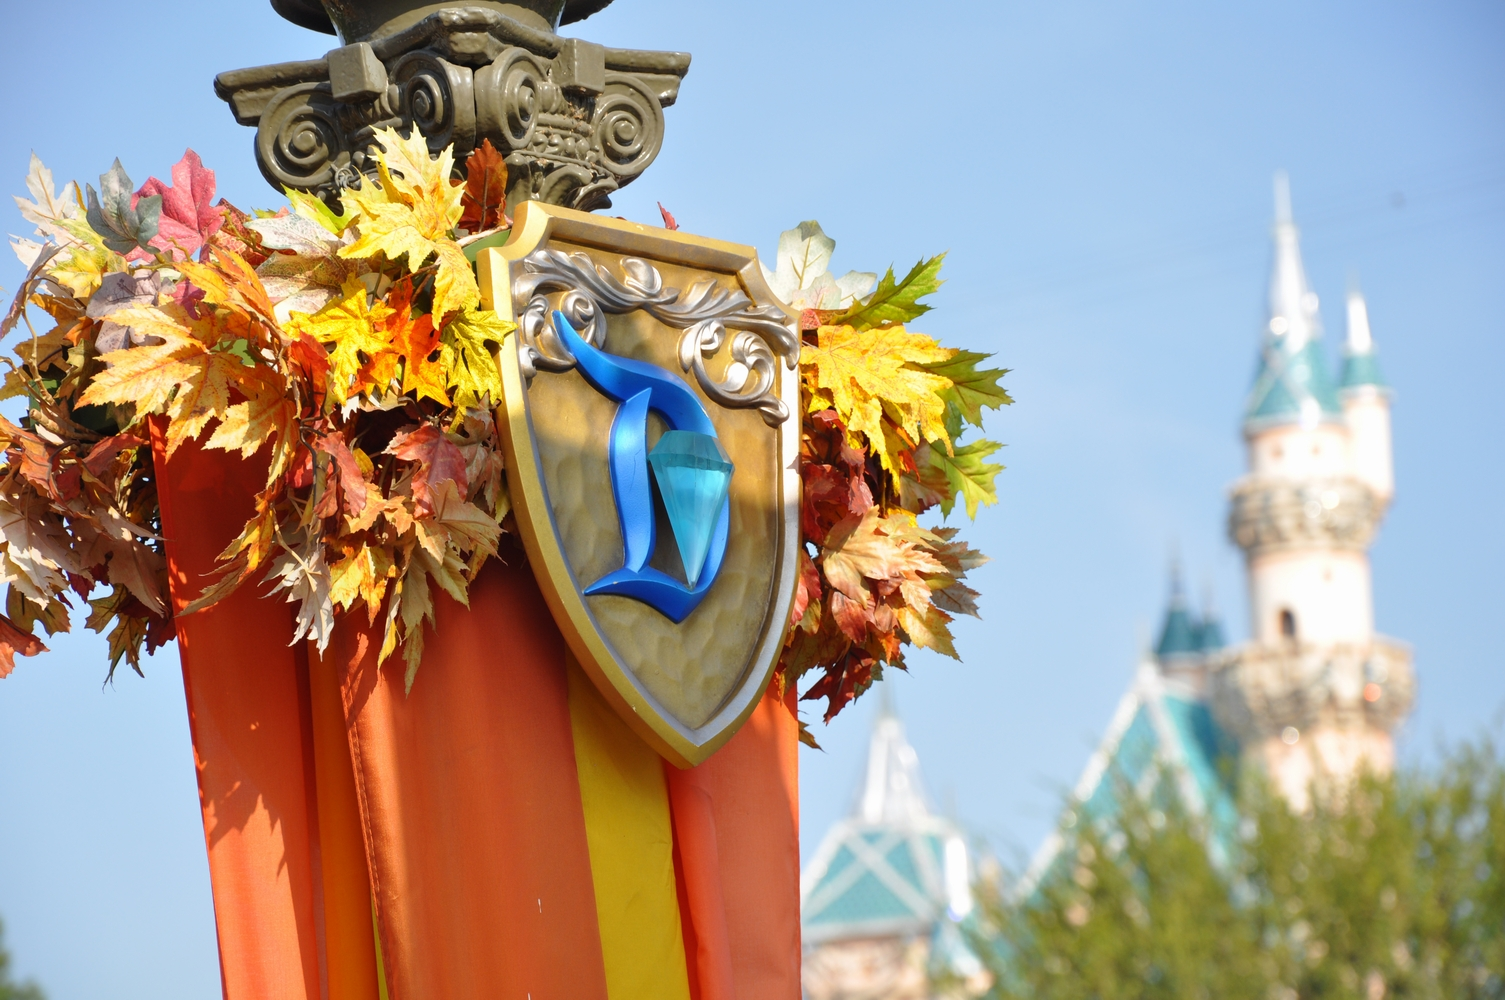 Disneyland w Anaheim